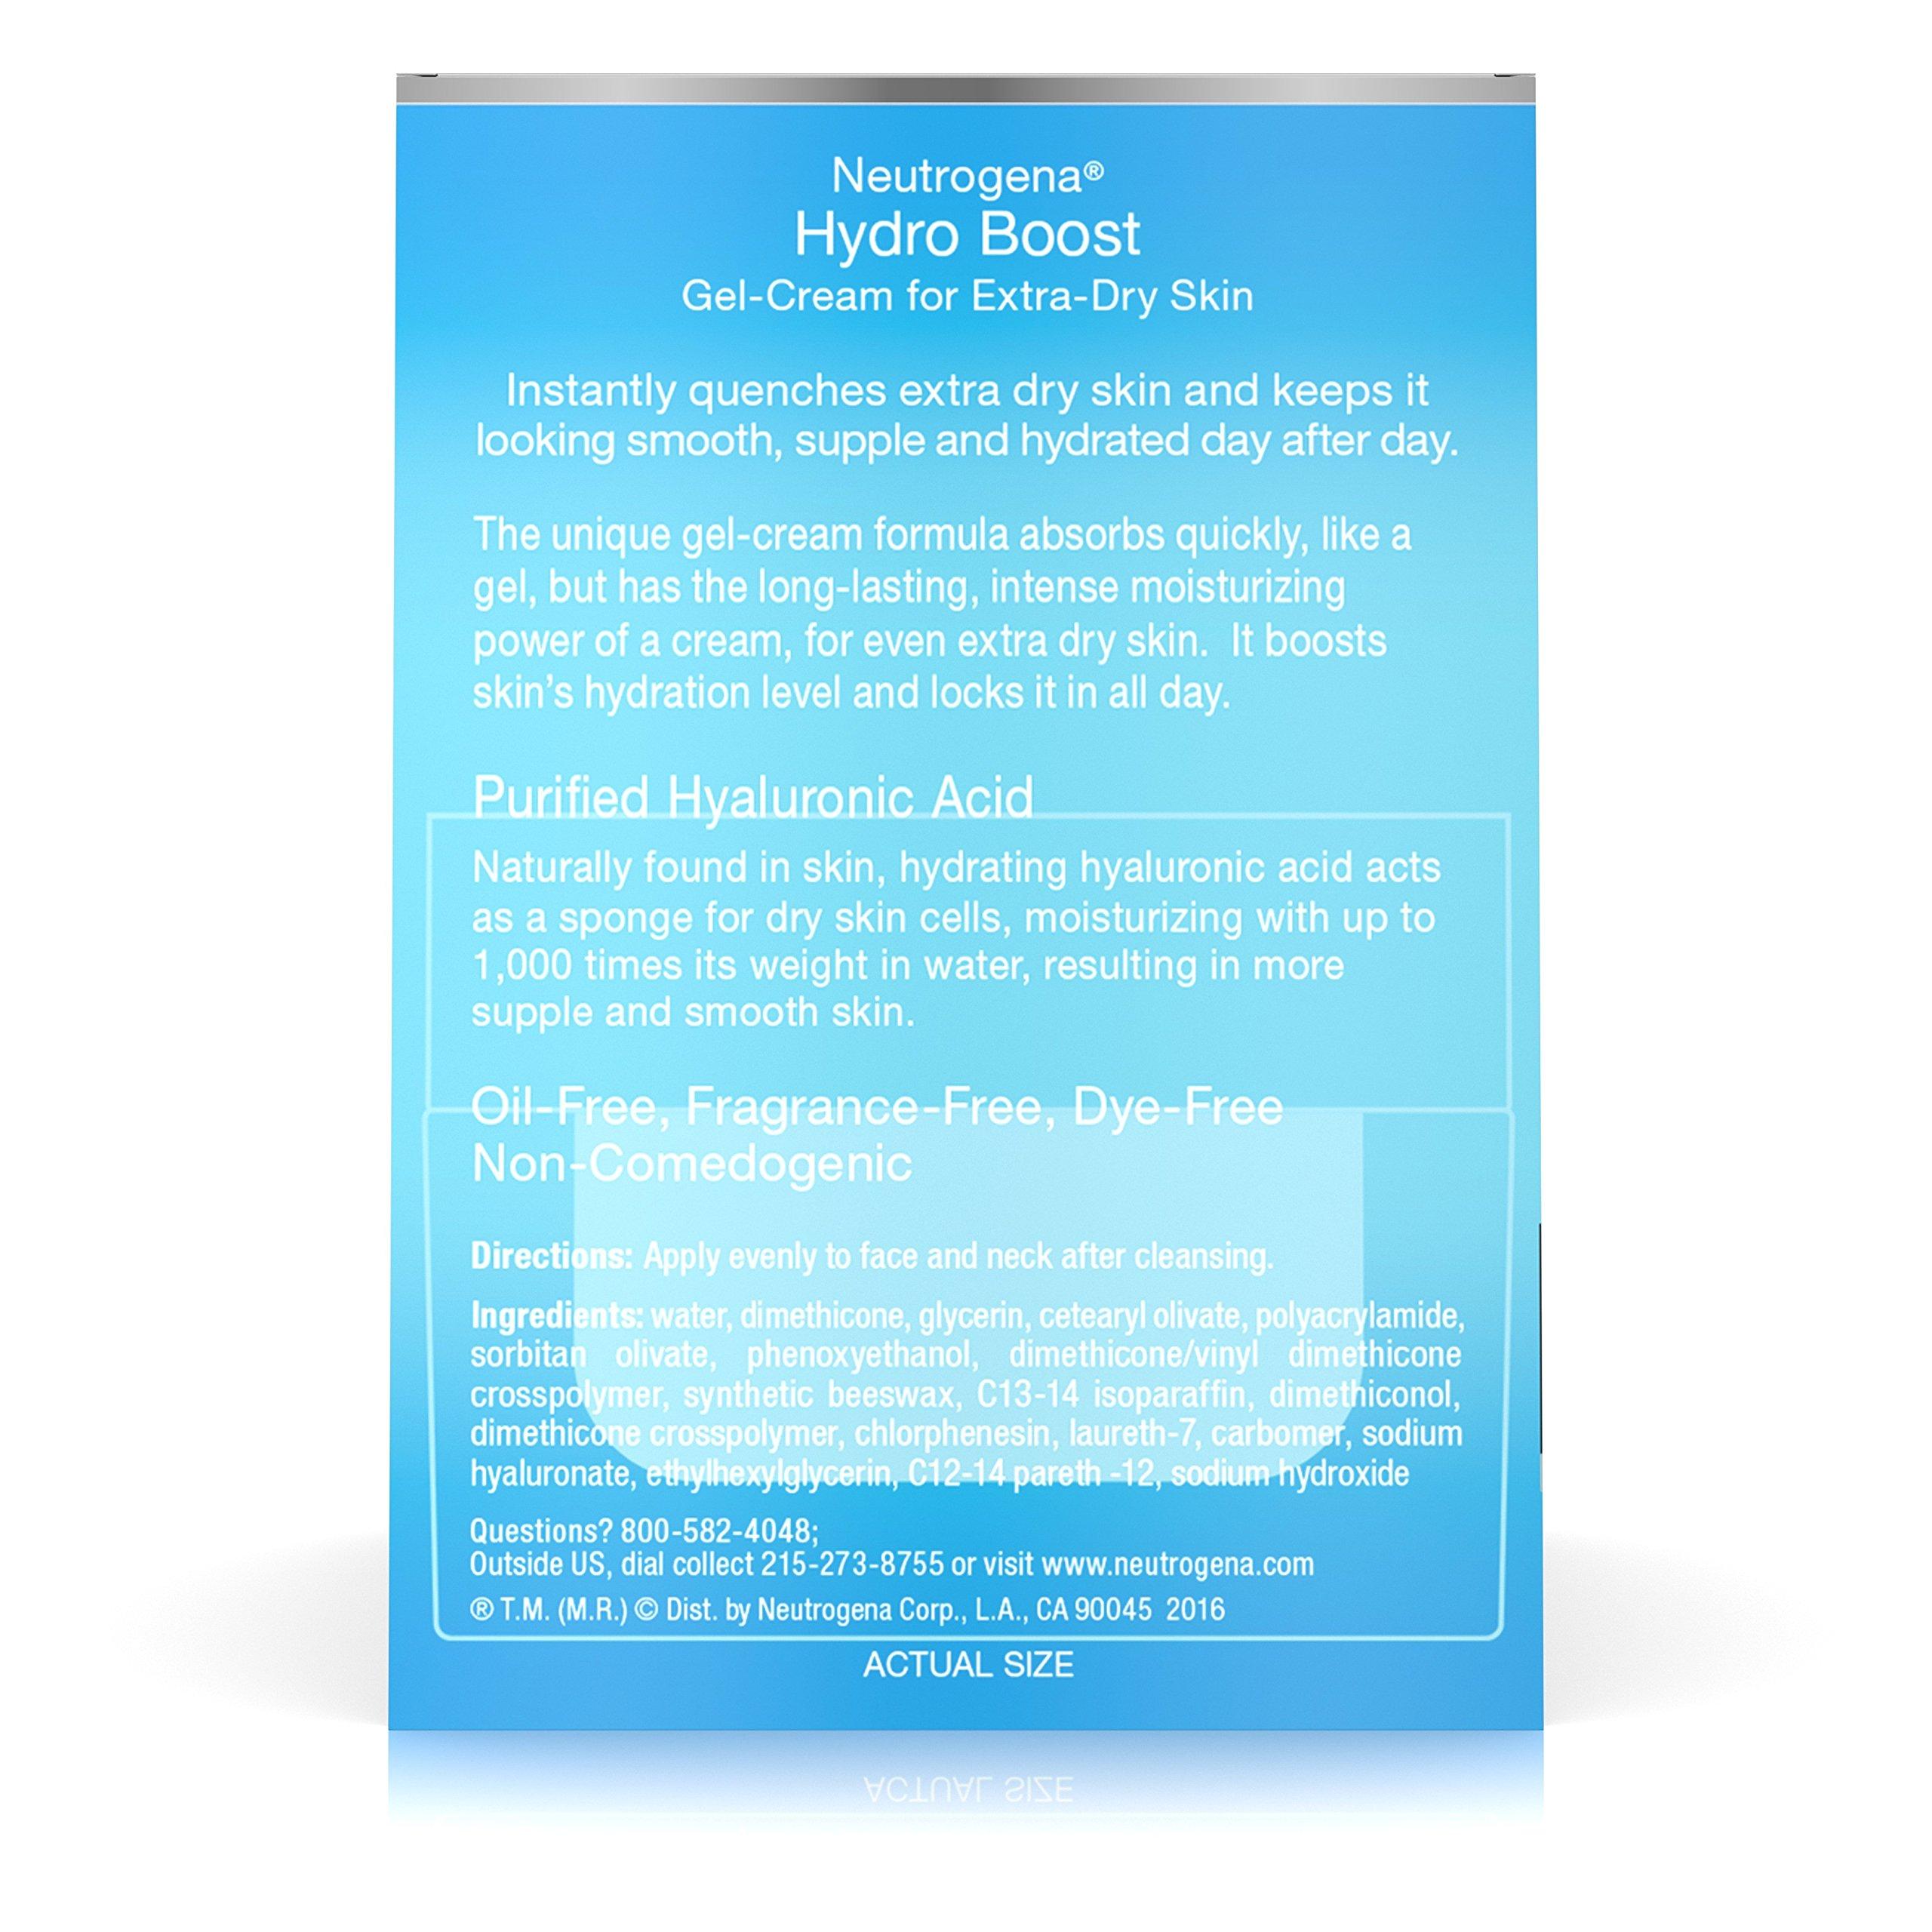 Neutrogena Hydro Boost Hyaluronic Acid Hydrating Face Moisturizer Gel-Cream to Hydrate and Smooth Extra-Dry Skin, 1.7 oz by Neutrogena (Image #9)